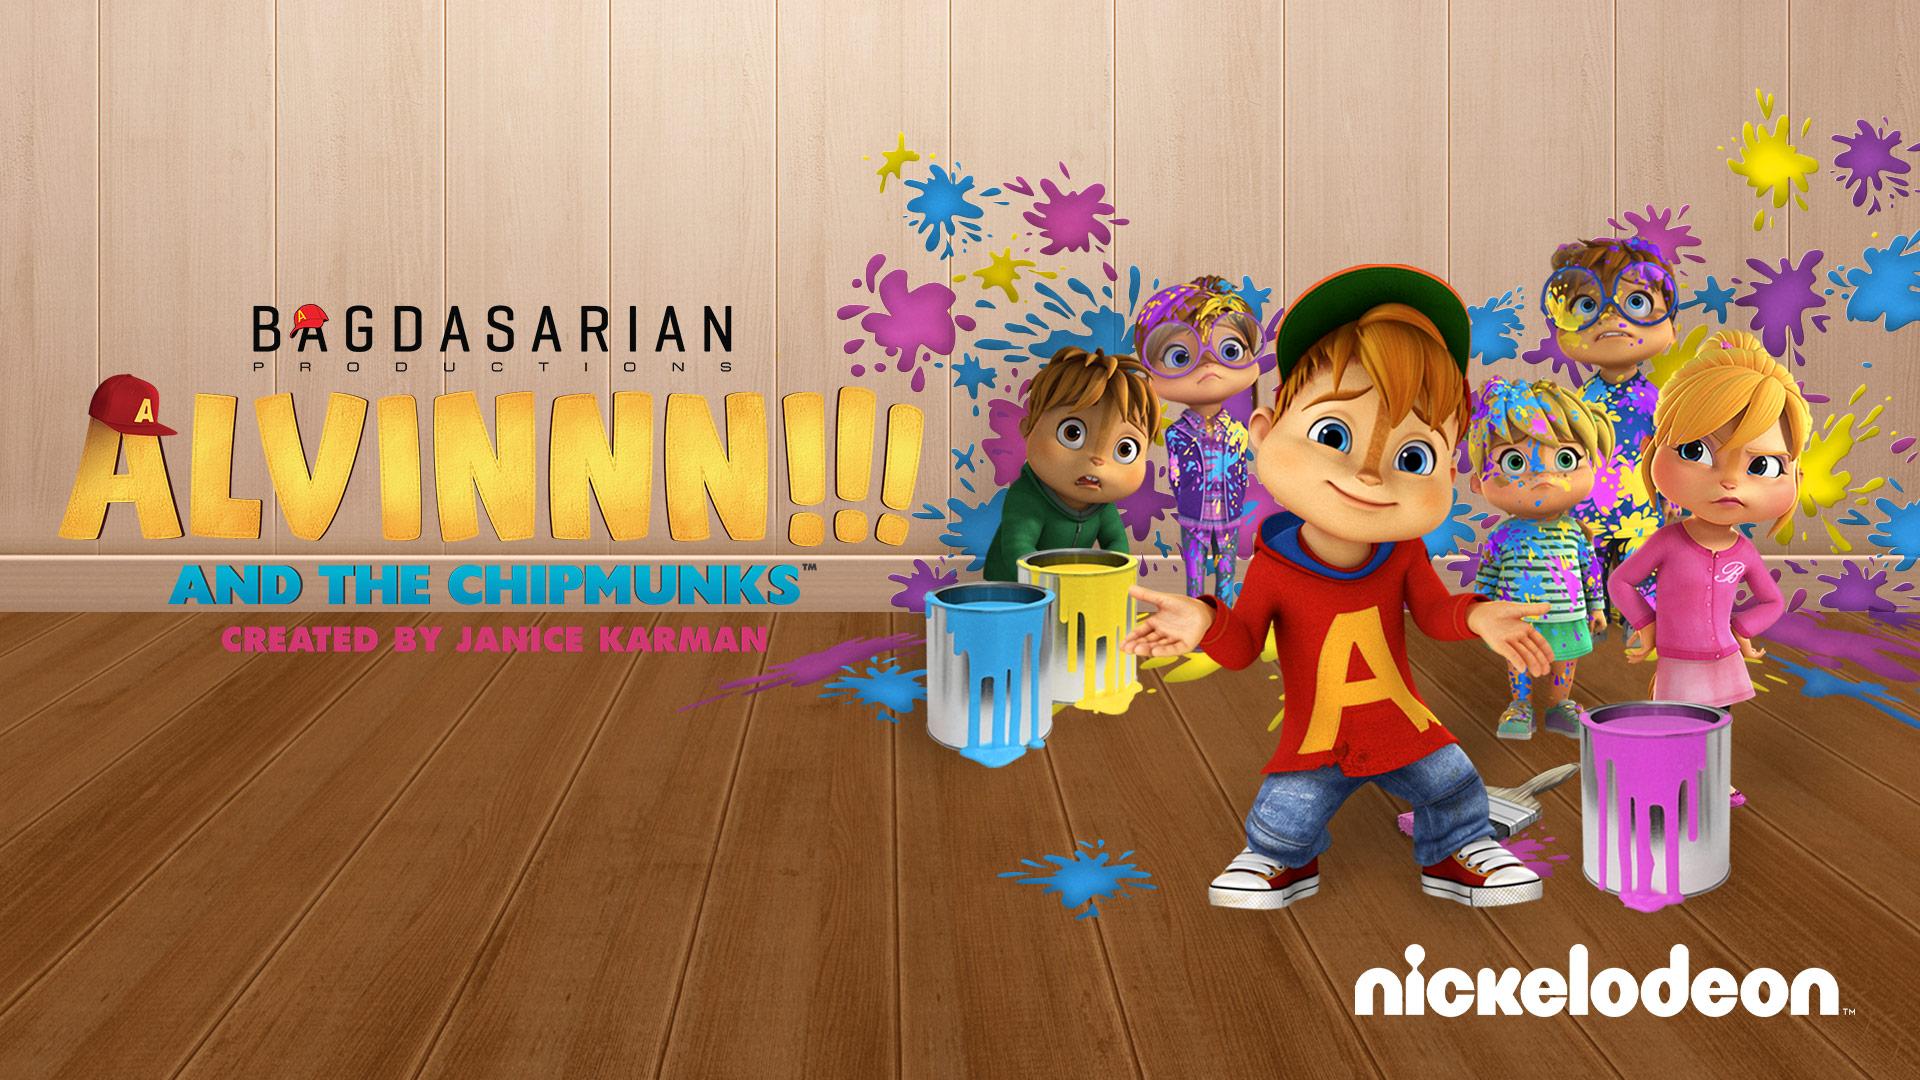 ALVINNN!!! and The Chipmunks Season 1